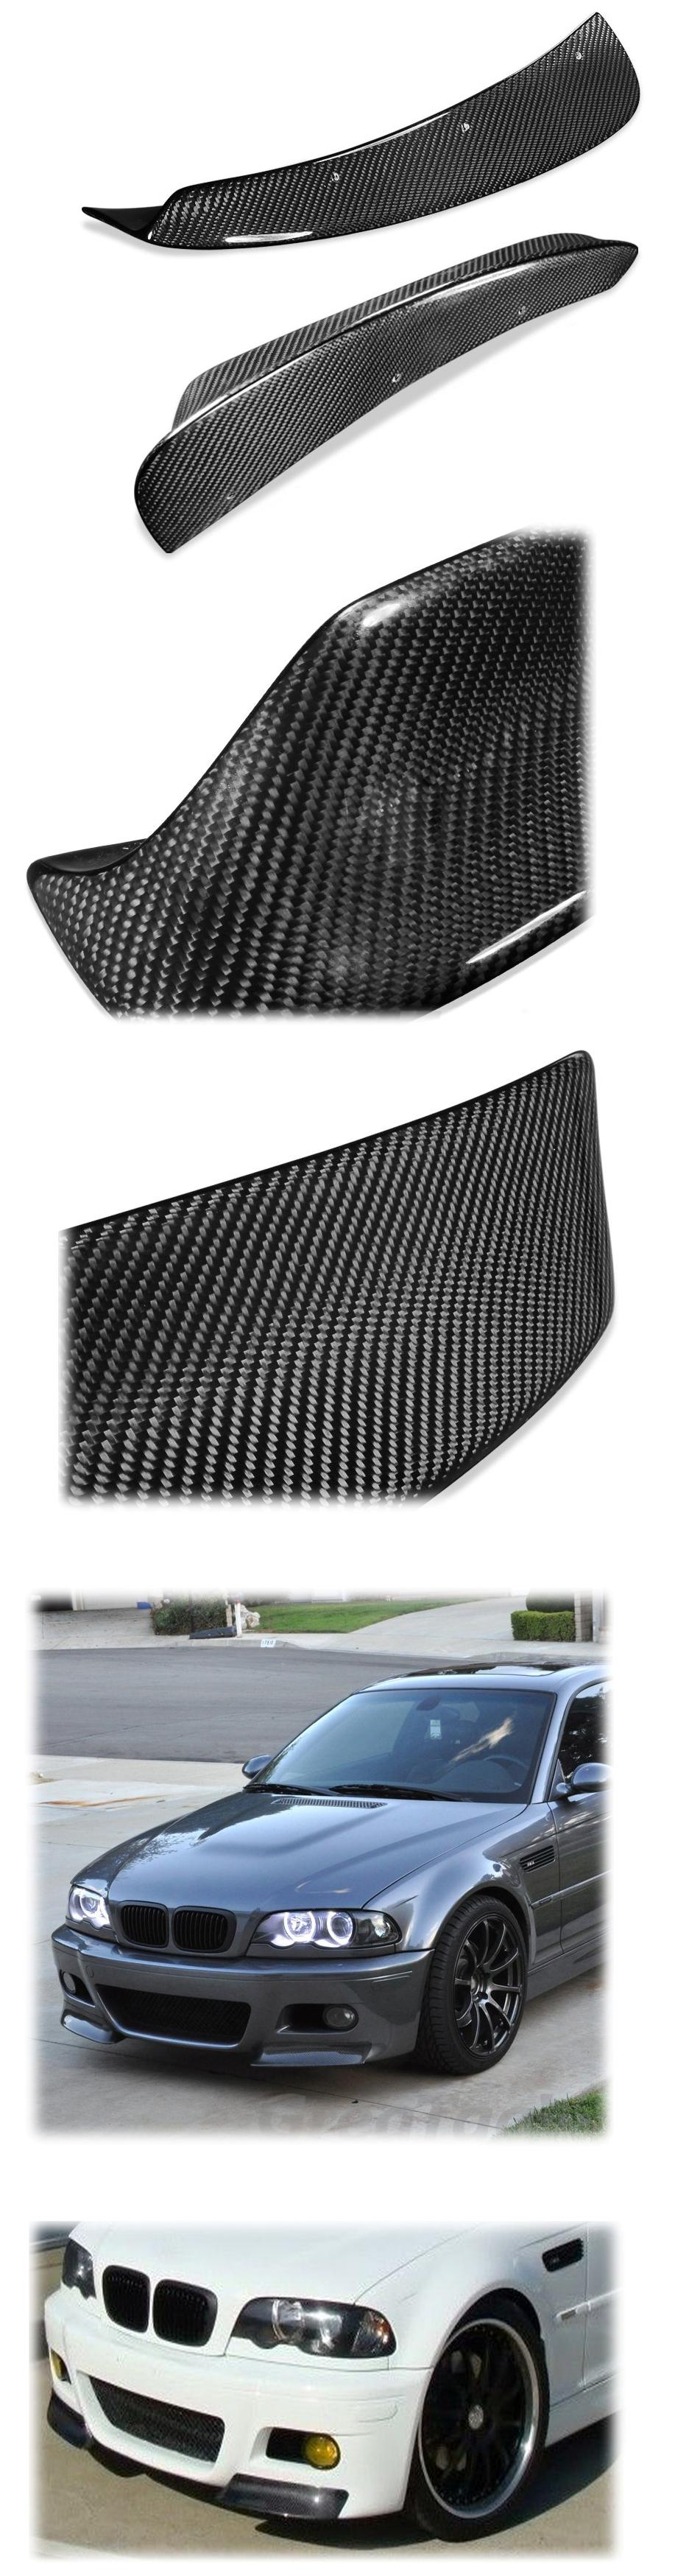 bmw e46 m3 style bumper splitter spoiler wing for bmw. Black Bedroom Furniture Sets. Home Design Ideas